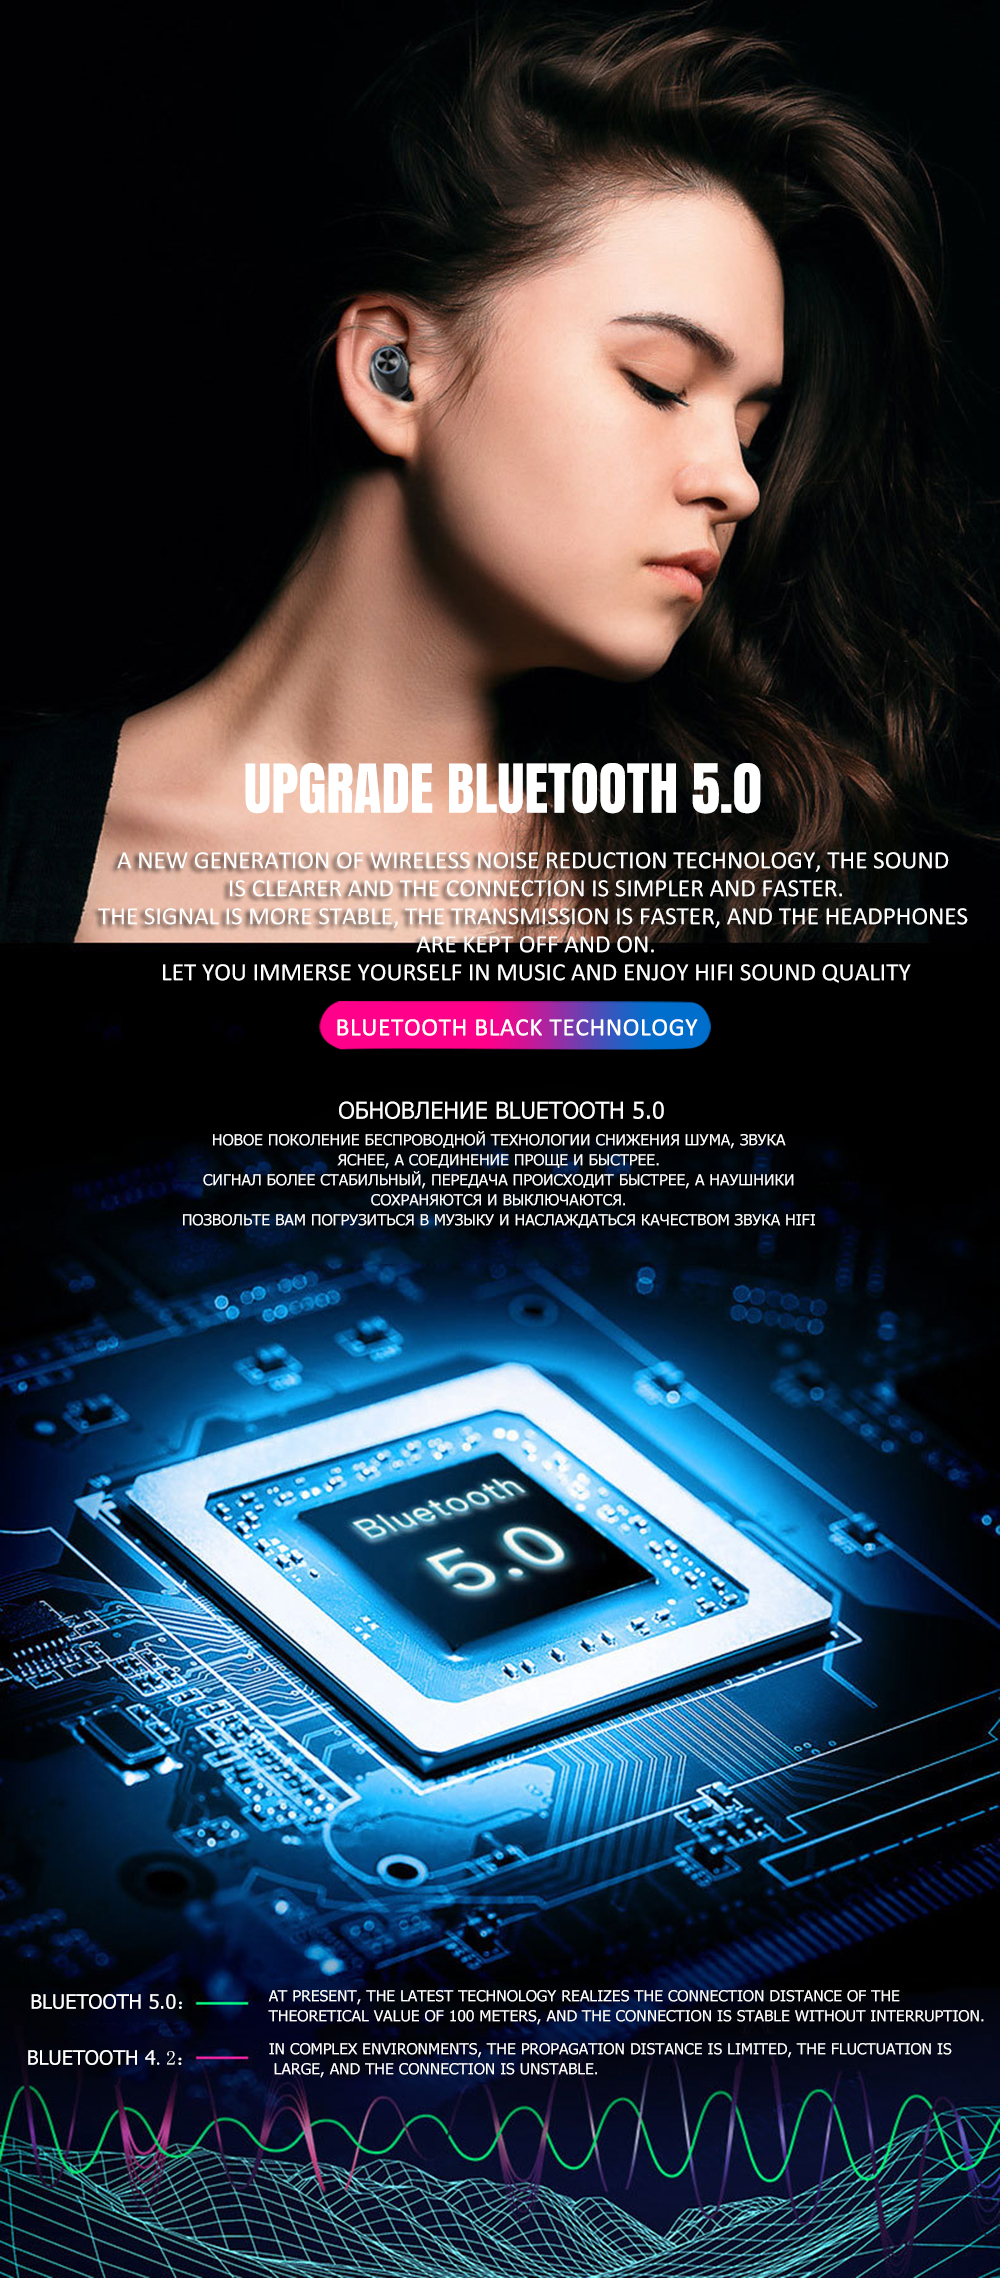 REALTEK 5.0 TWS VAORLO Verdadeira Música Estéreo